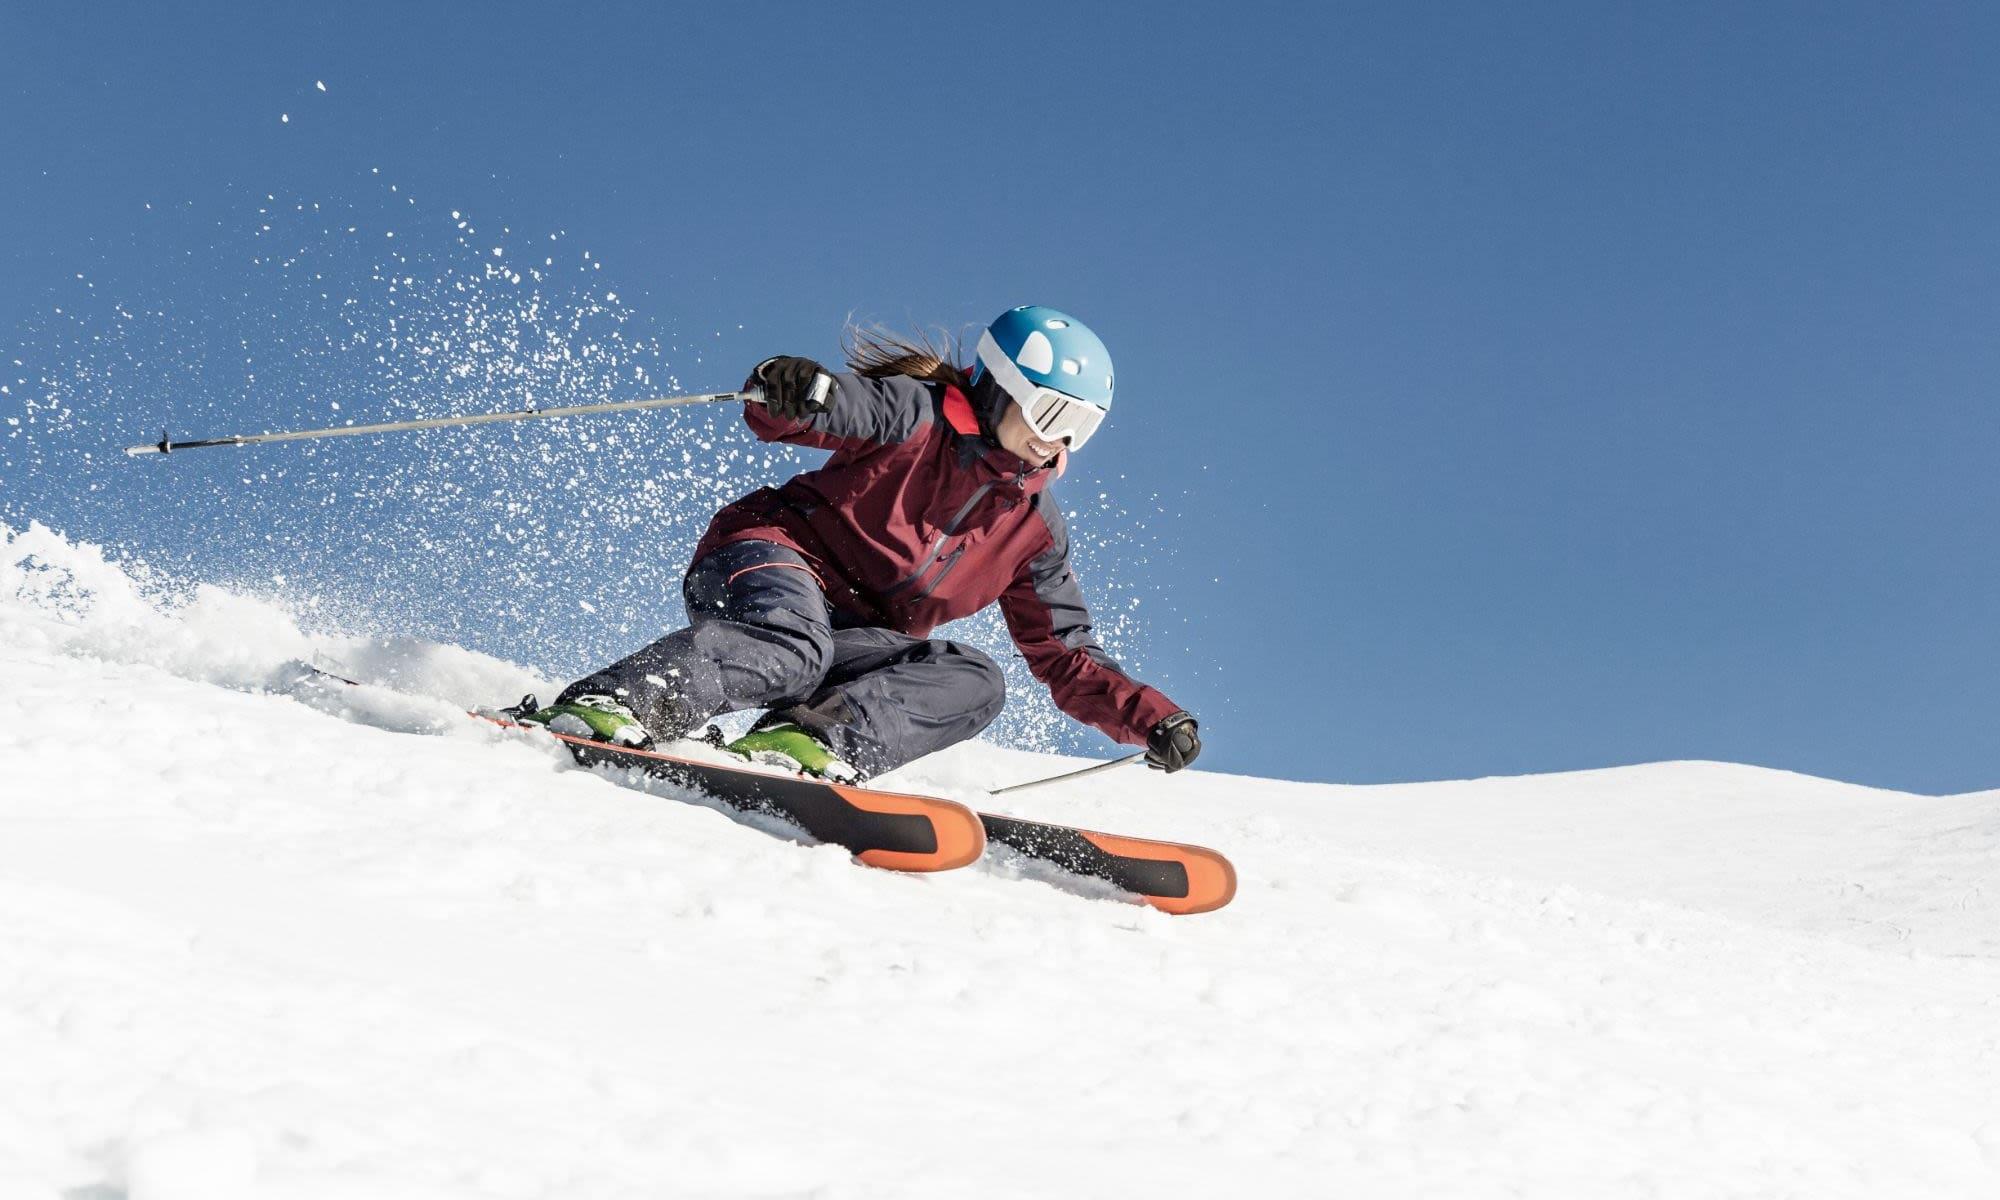 Skiing the mountain near Liberty SKY in Salt Lake City, Utah